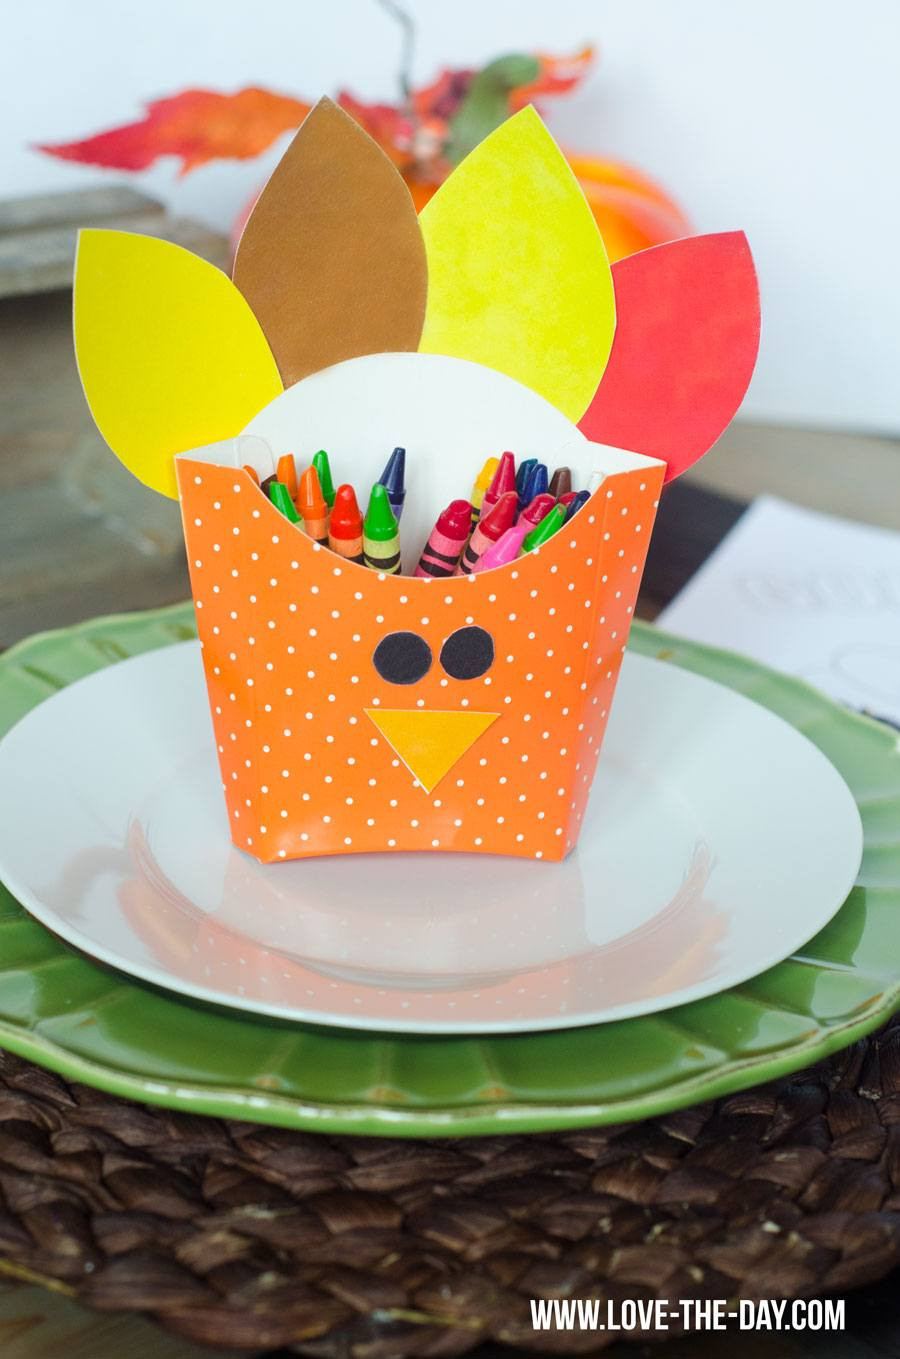 Craft For Kids  10 Fun Thanksgiving Crafts For Kids Resin Crafts